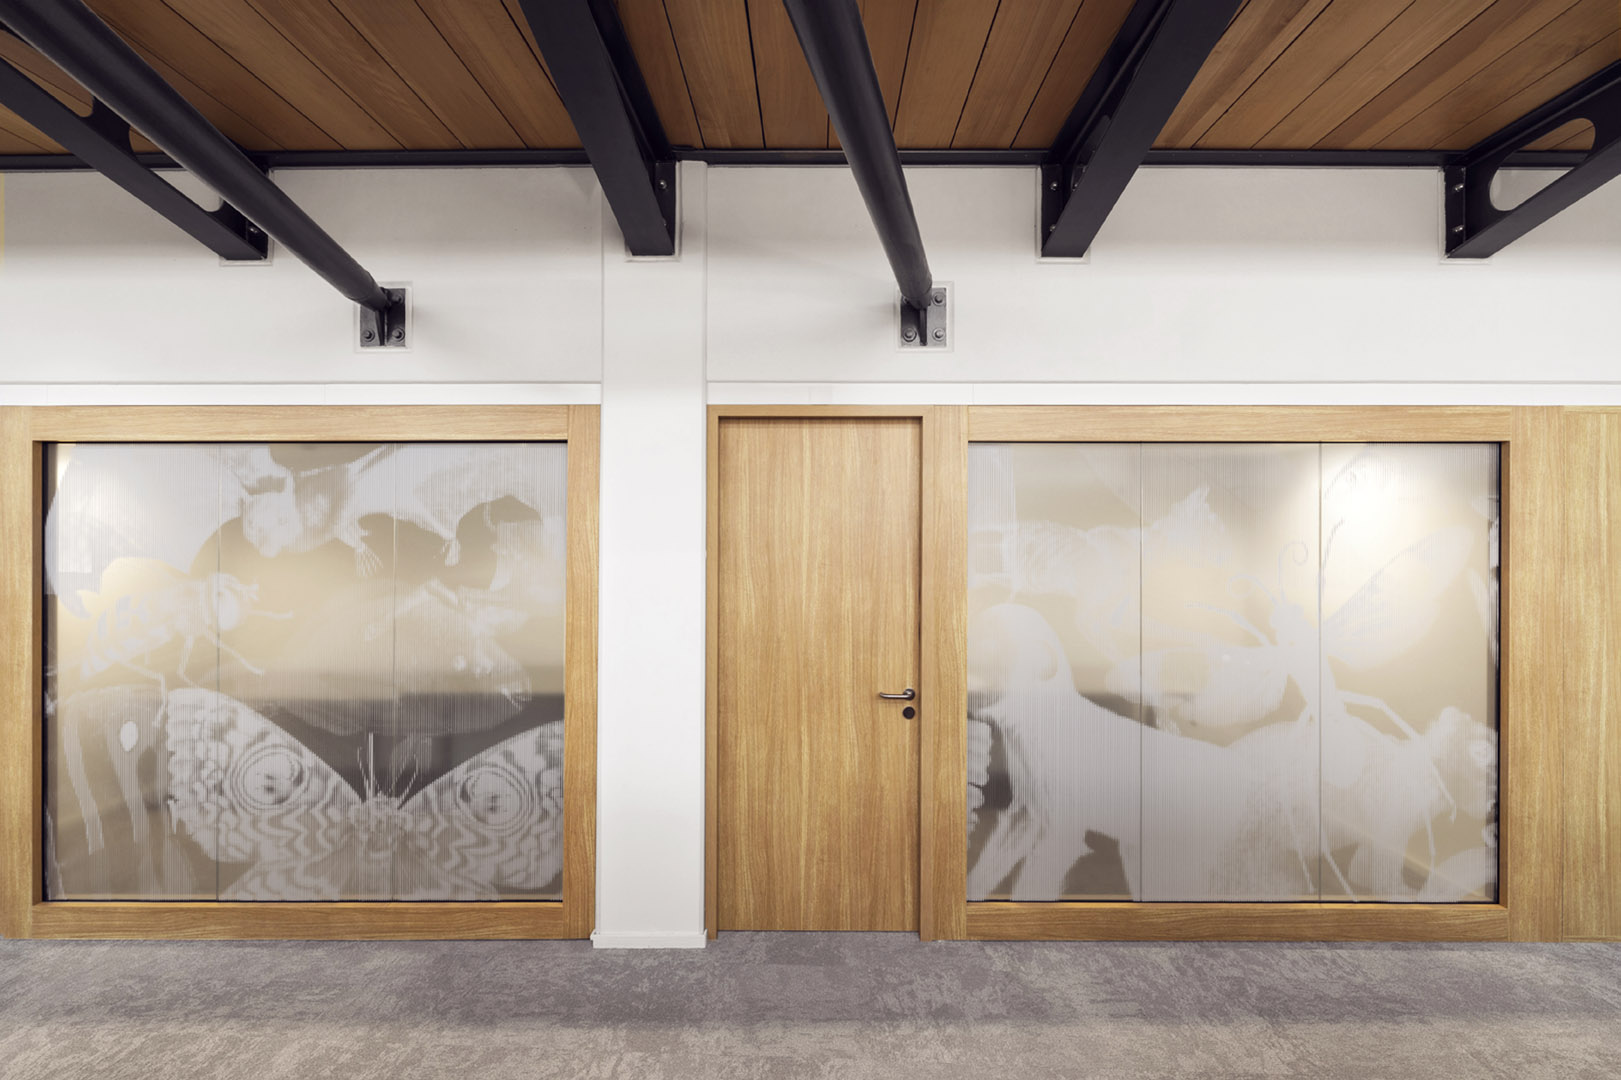 naturalis-interieur-hollandse-nieuwe-11